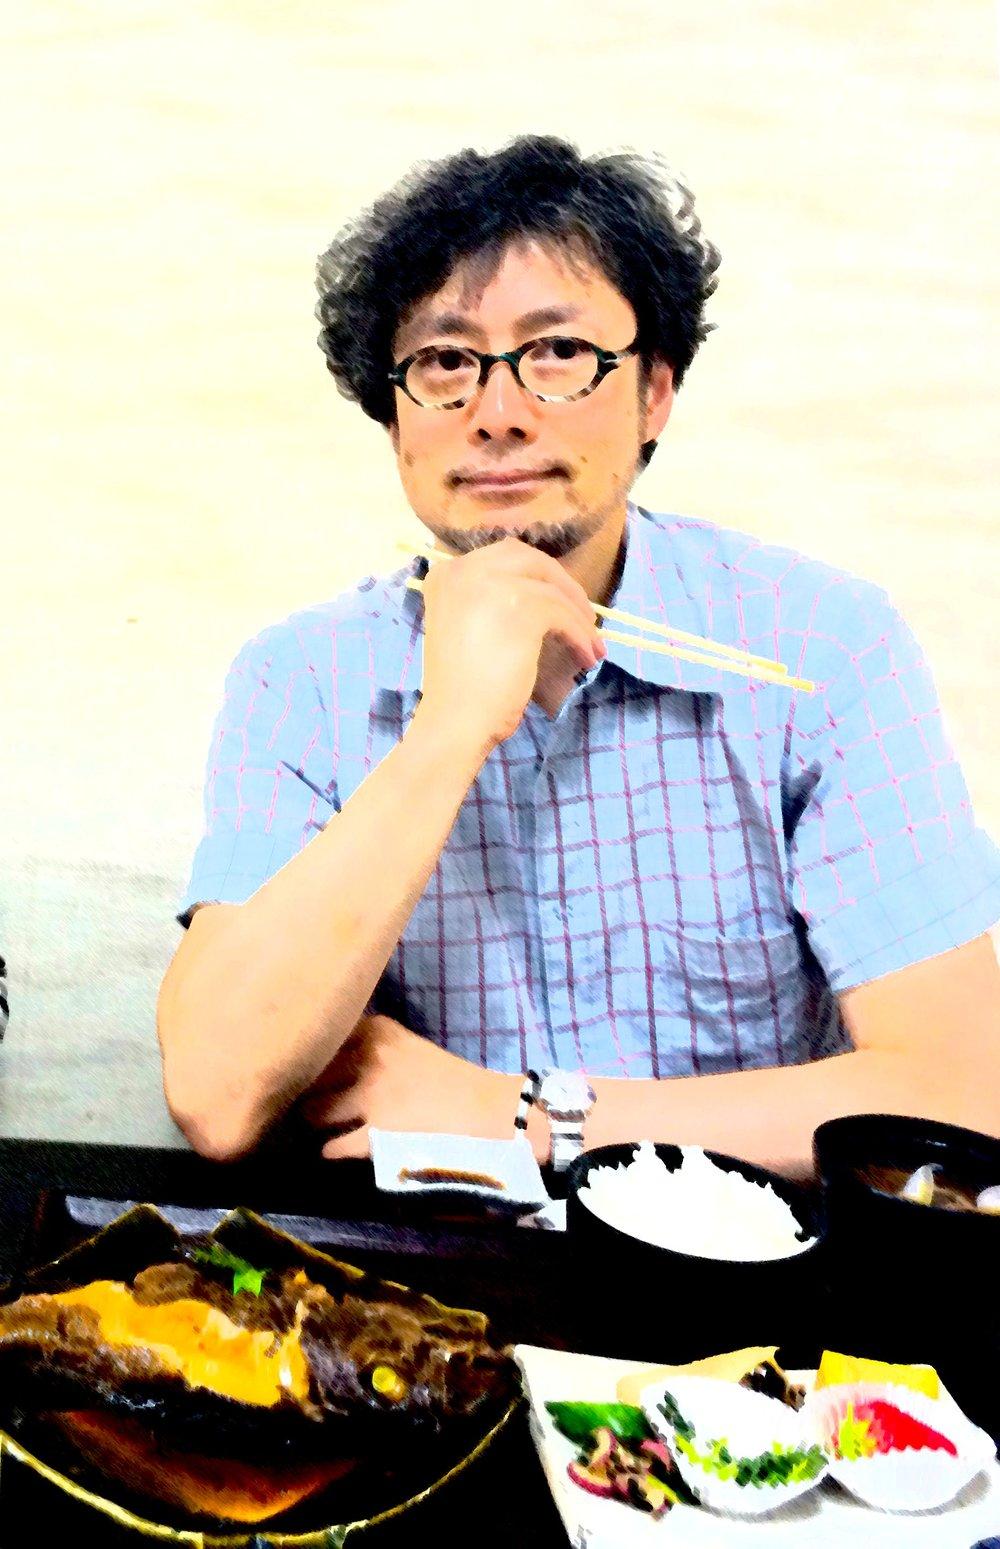 Shirinihokake